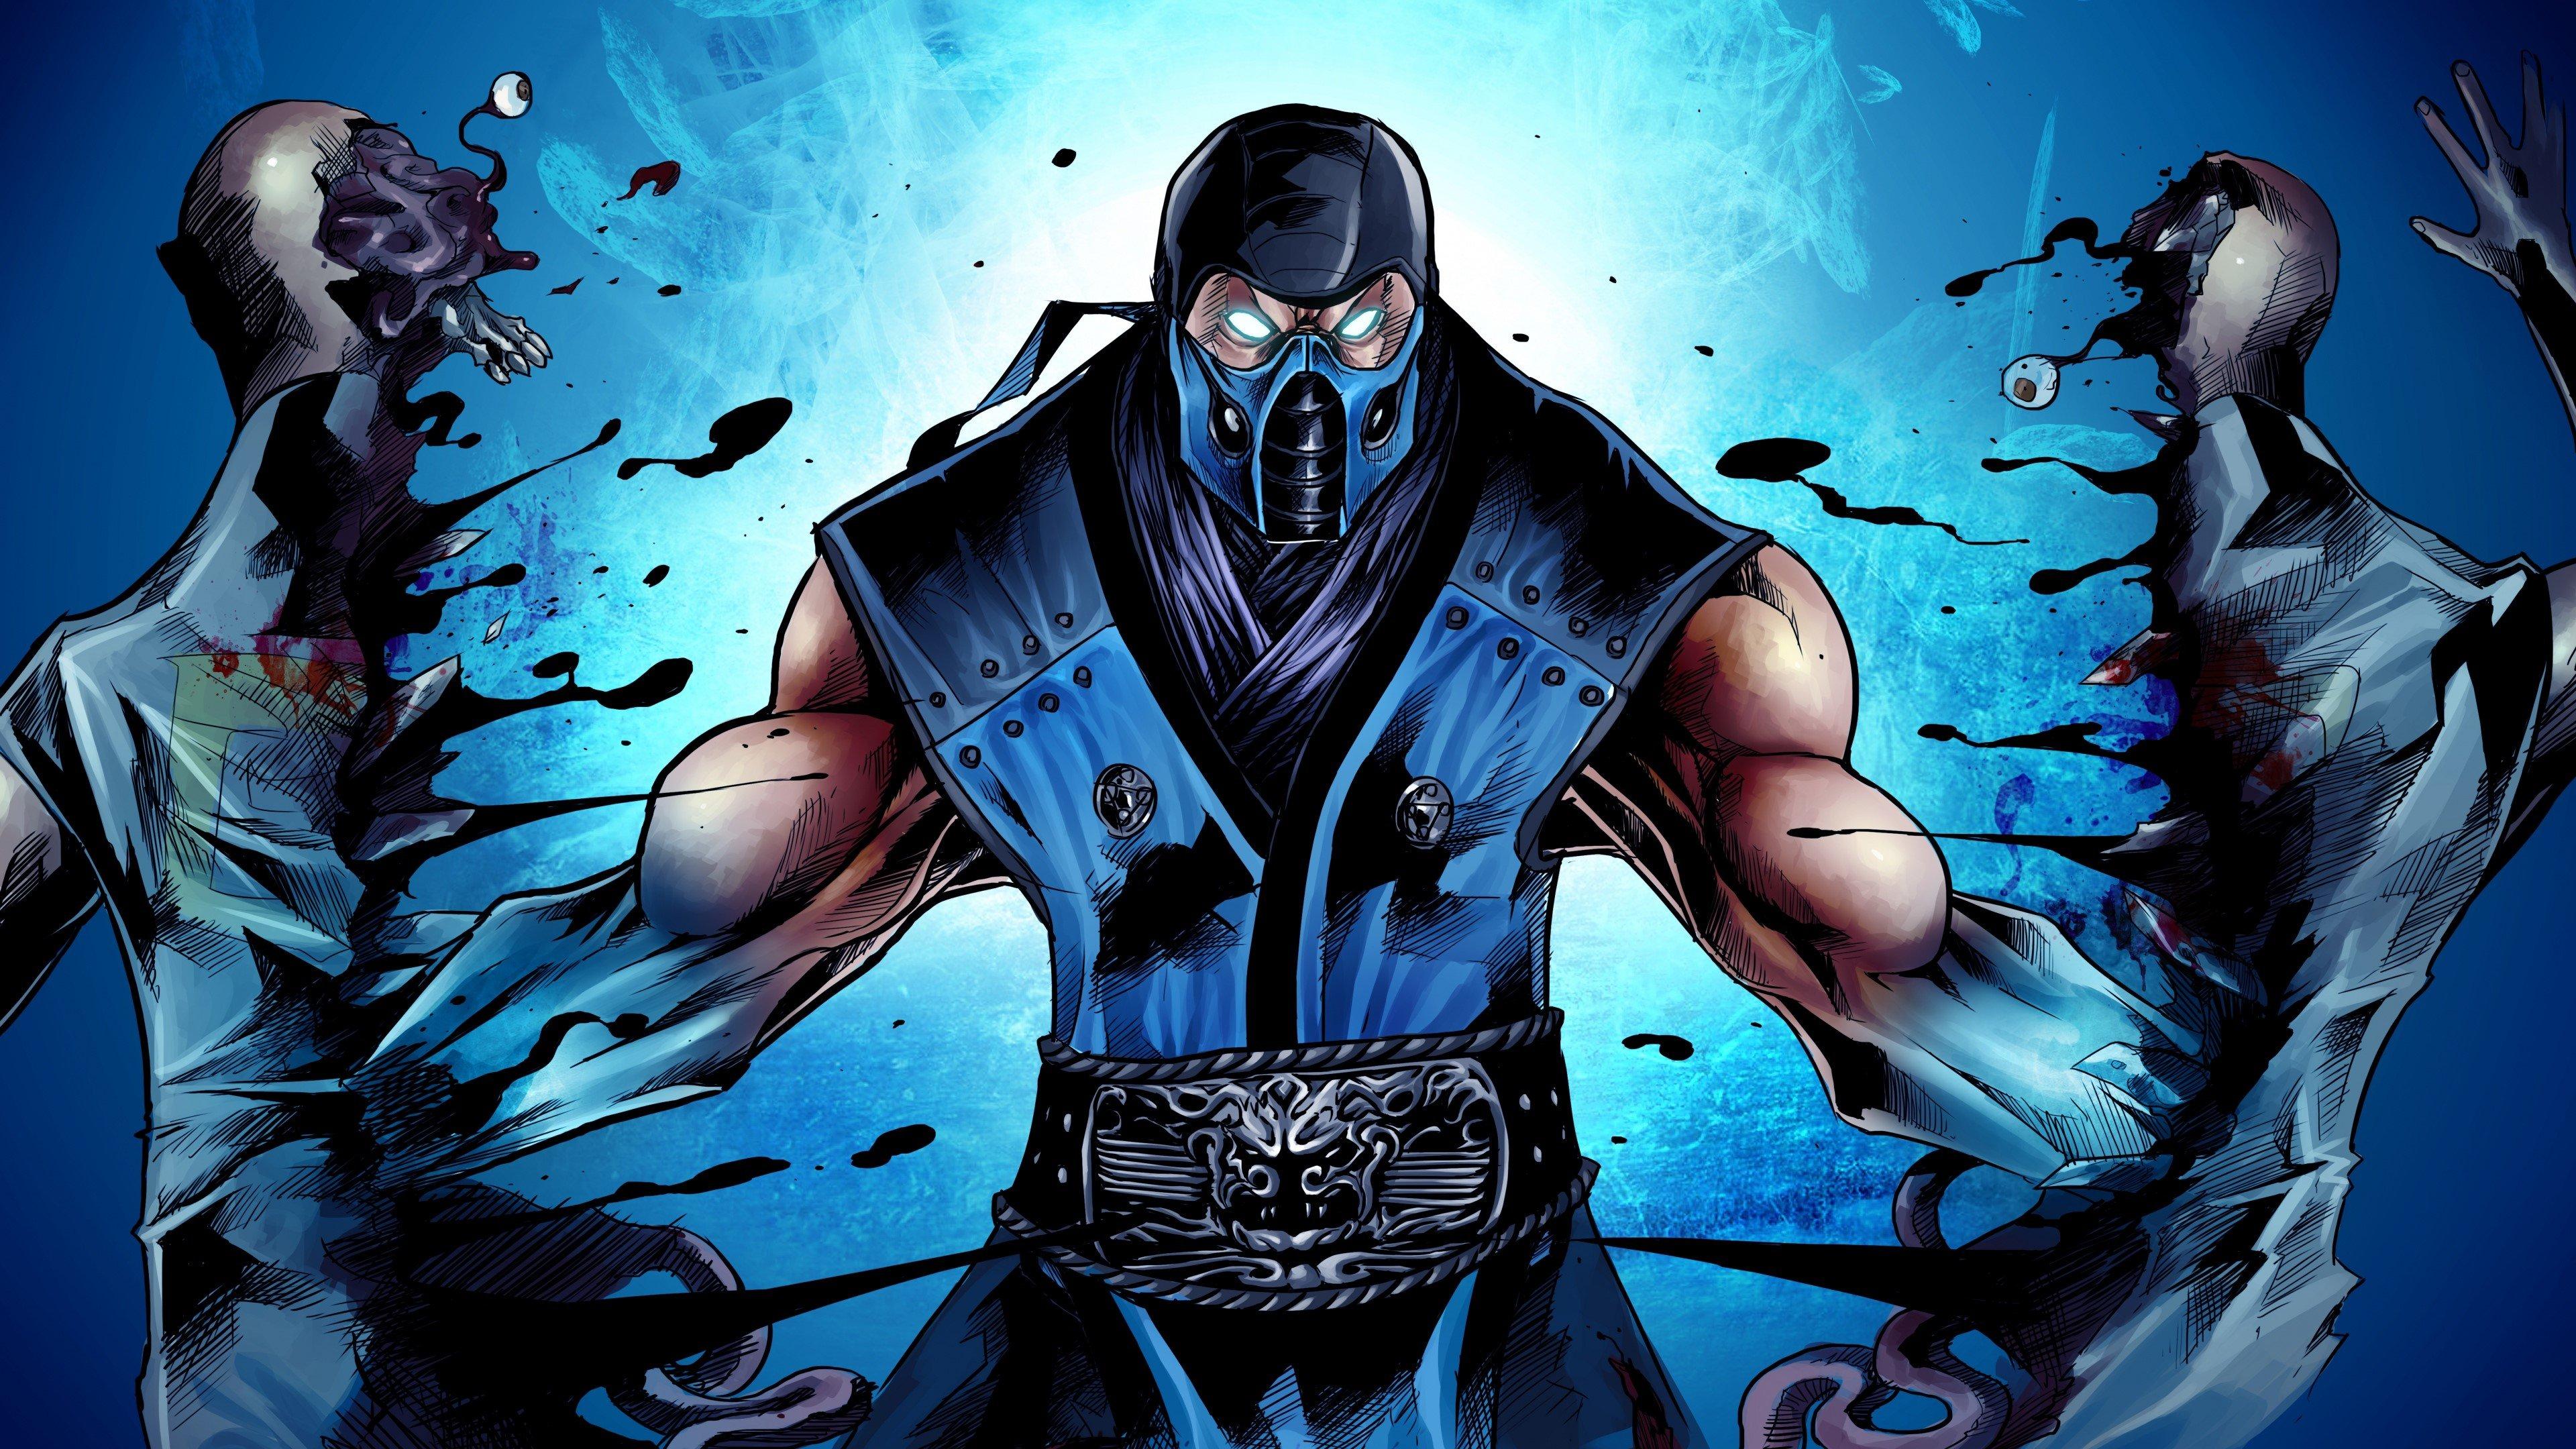 Wallpaper Ninja from the game Mortal Kombat